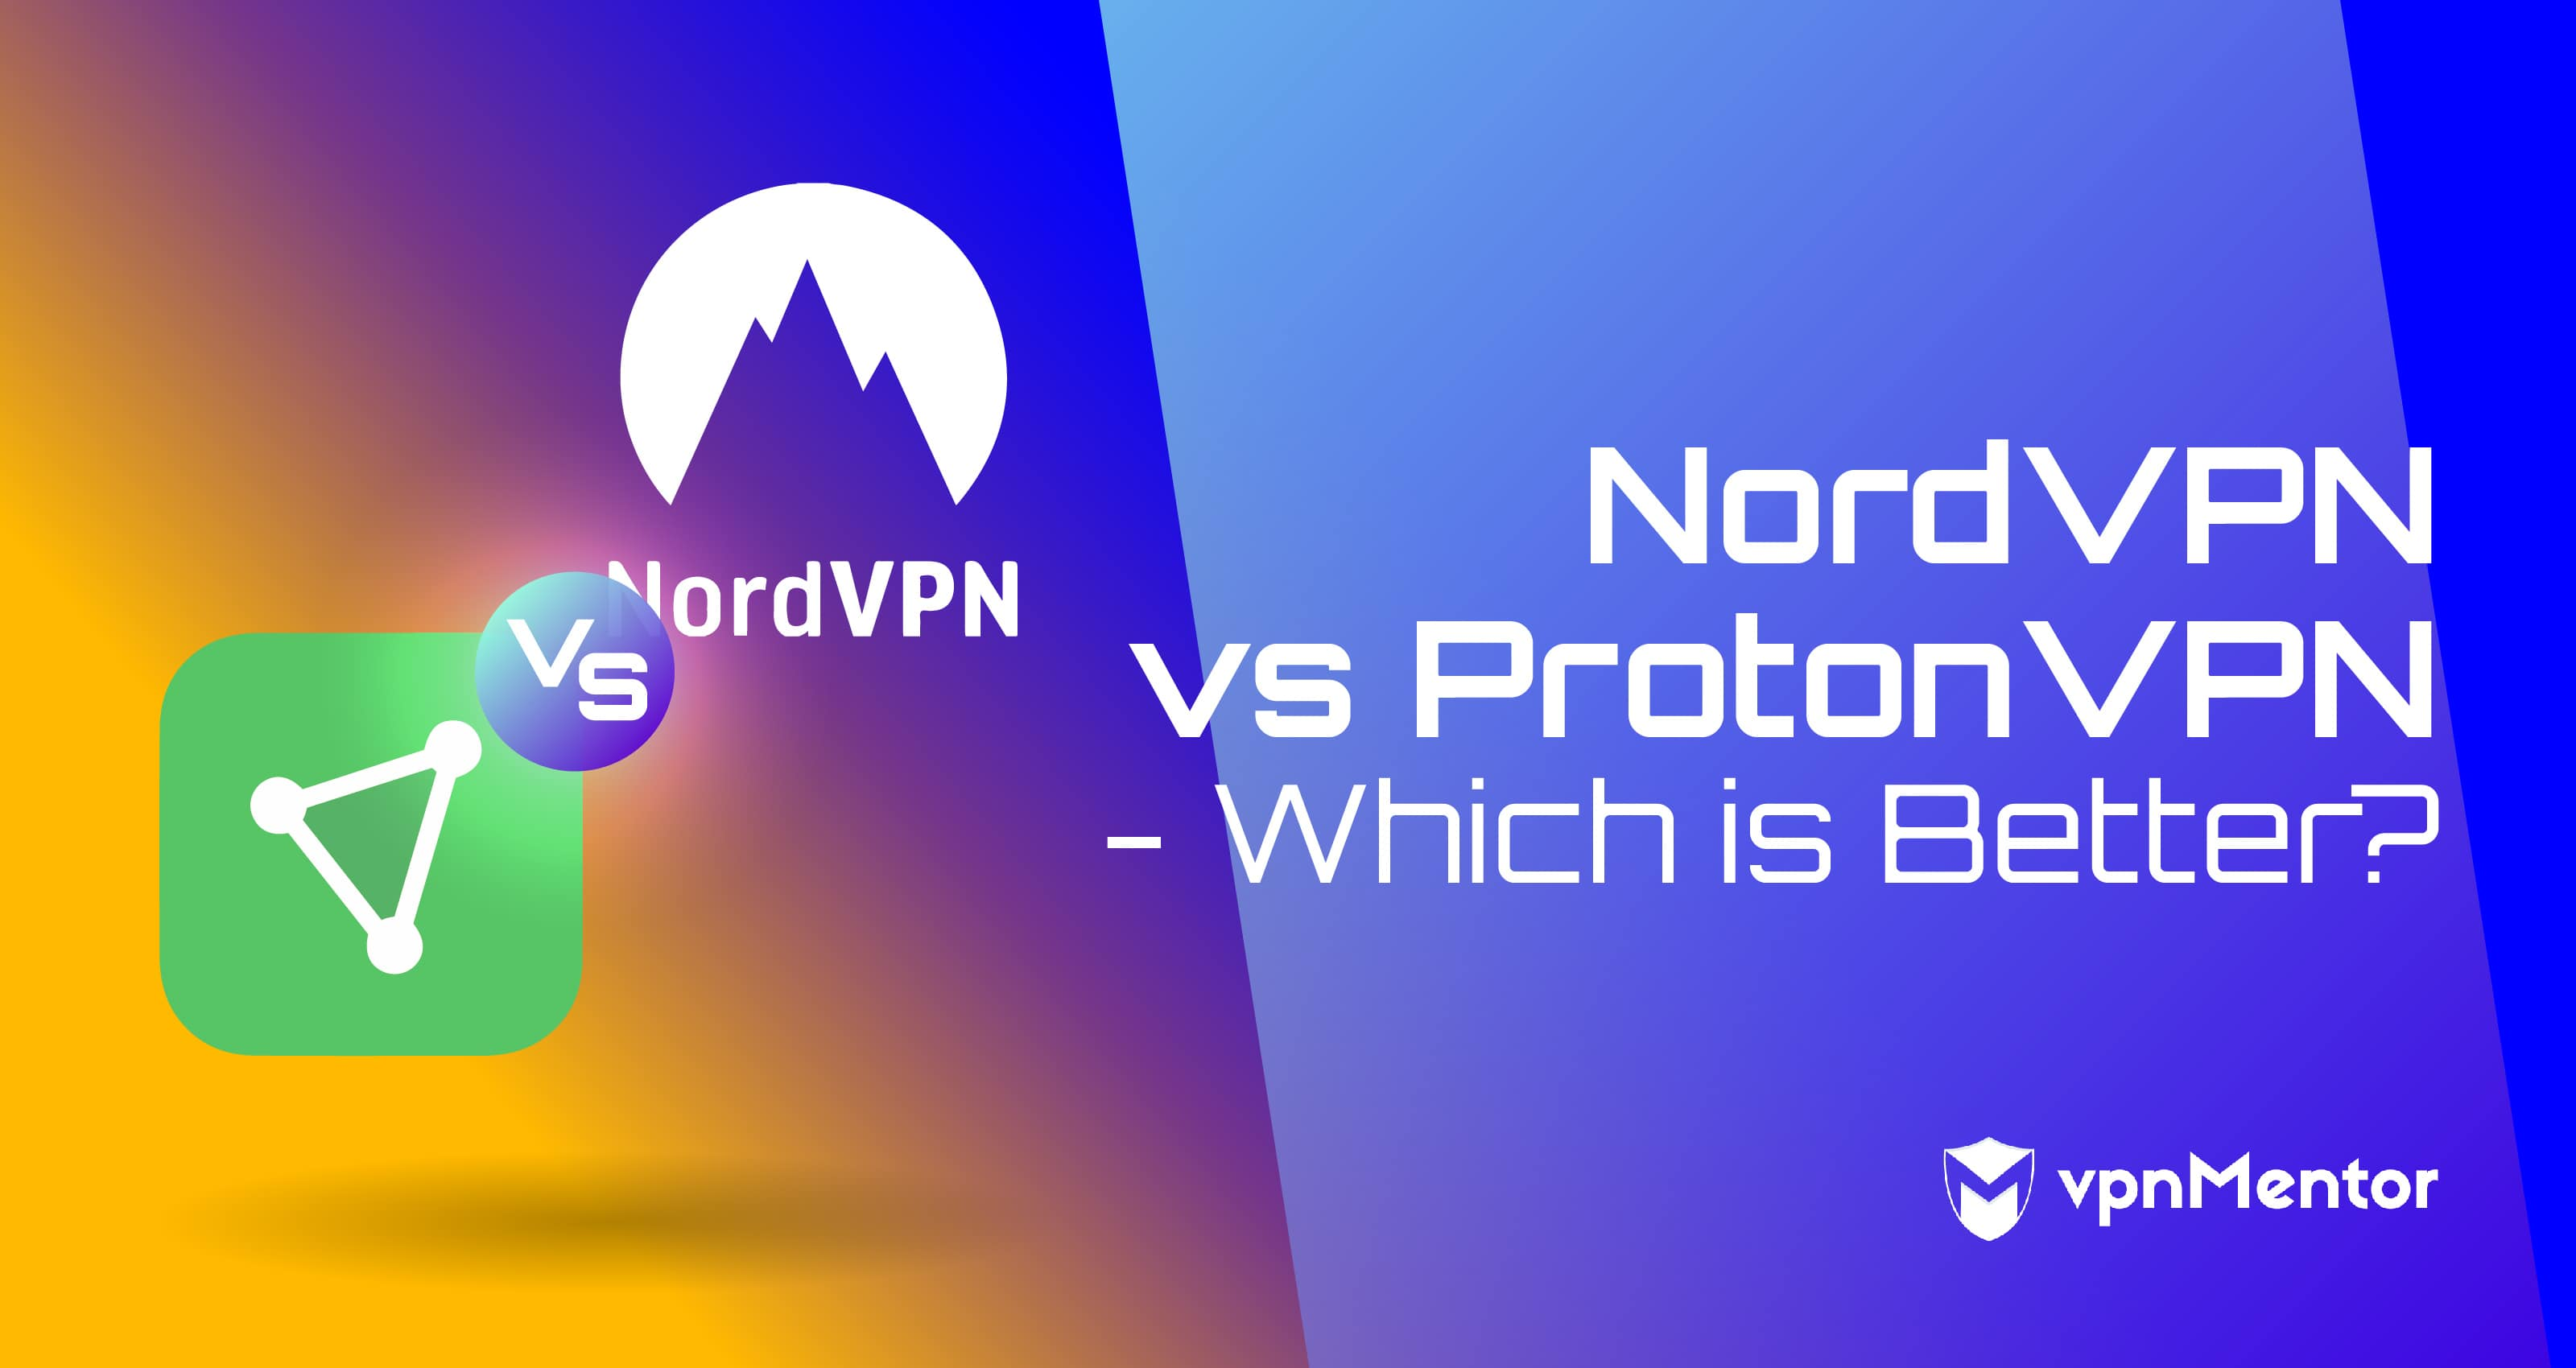 NordVPN vs ProtonVPN Comparison – Which Is Best for You in 2019?